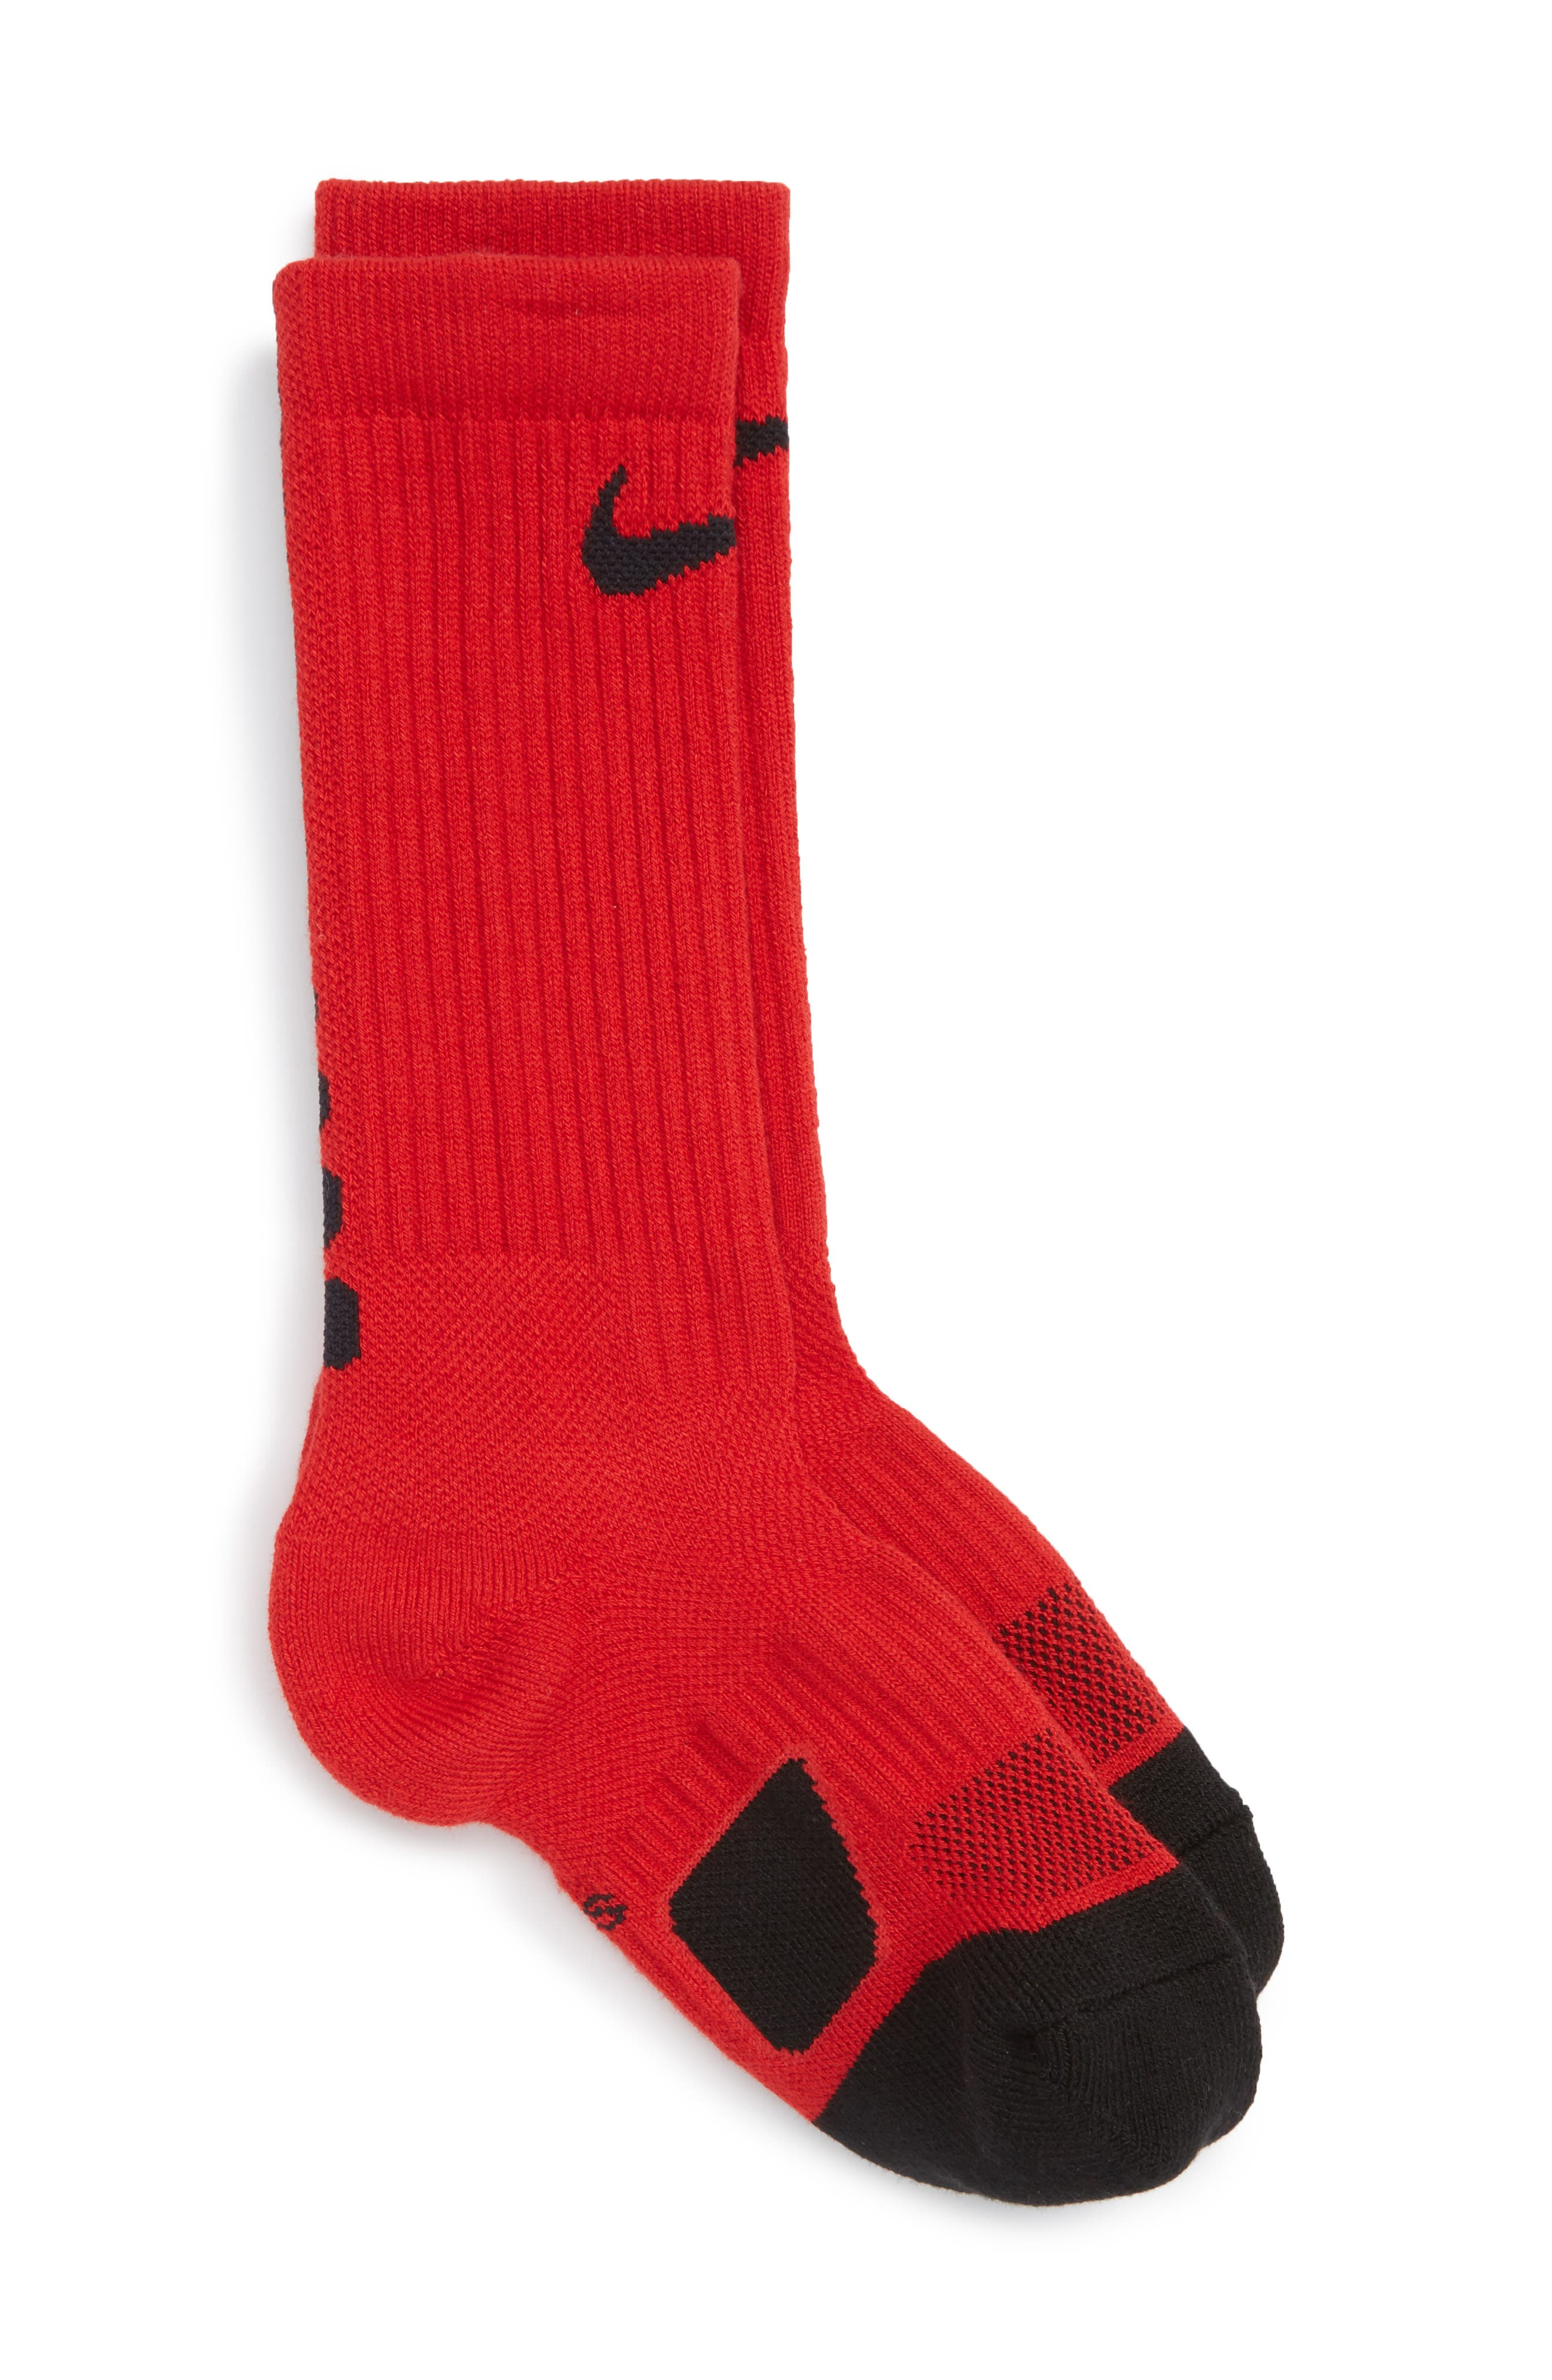 Main Image - Nike Elite Versatility Crew Socks (Big Kid)